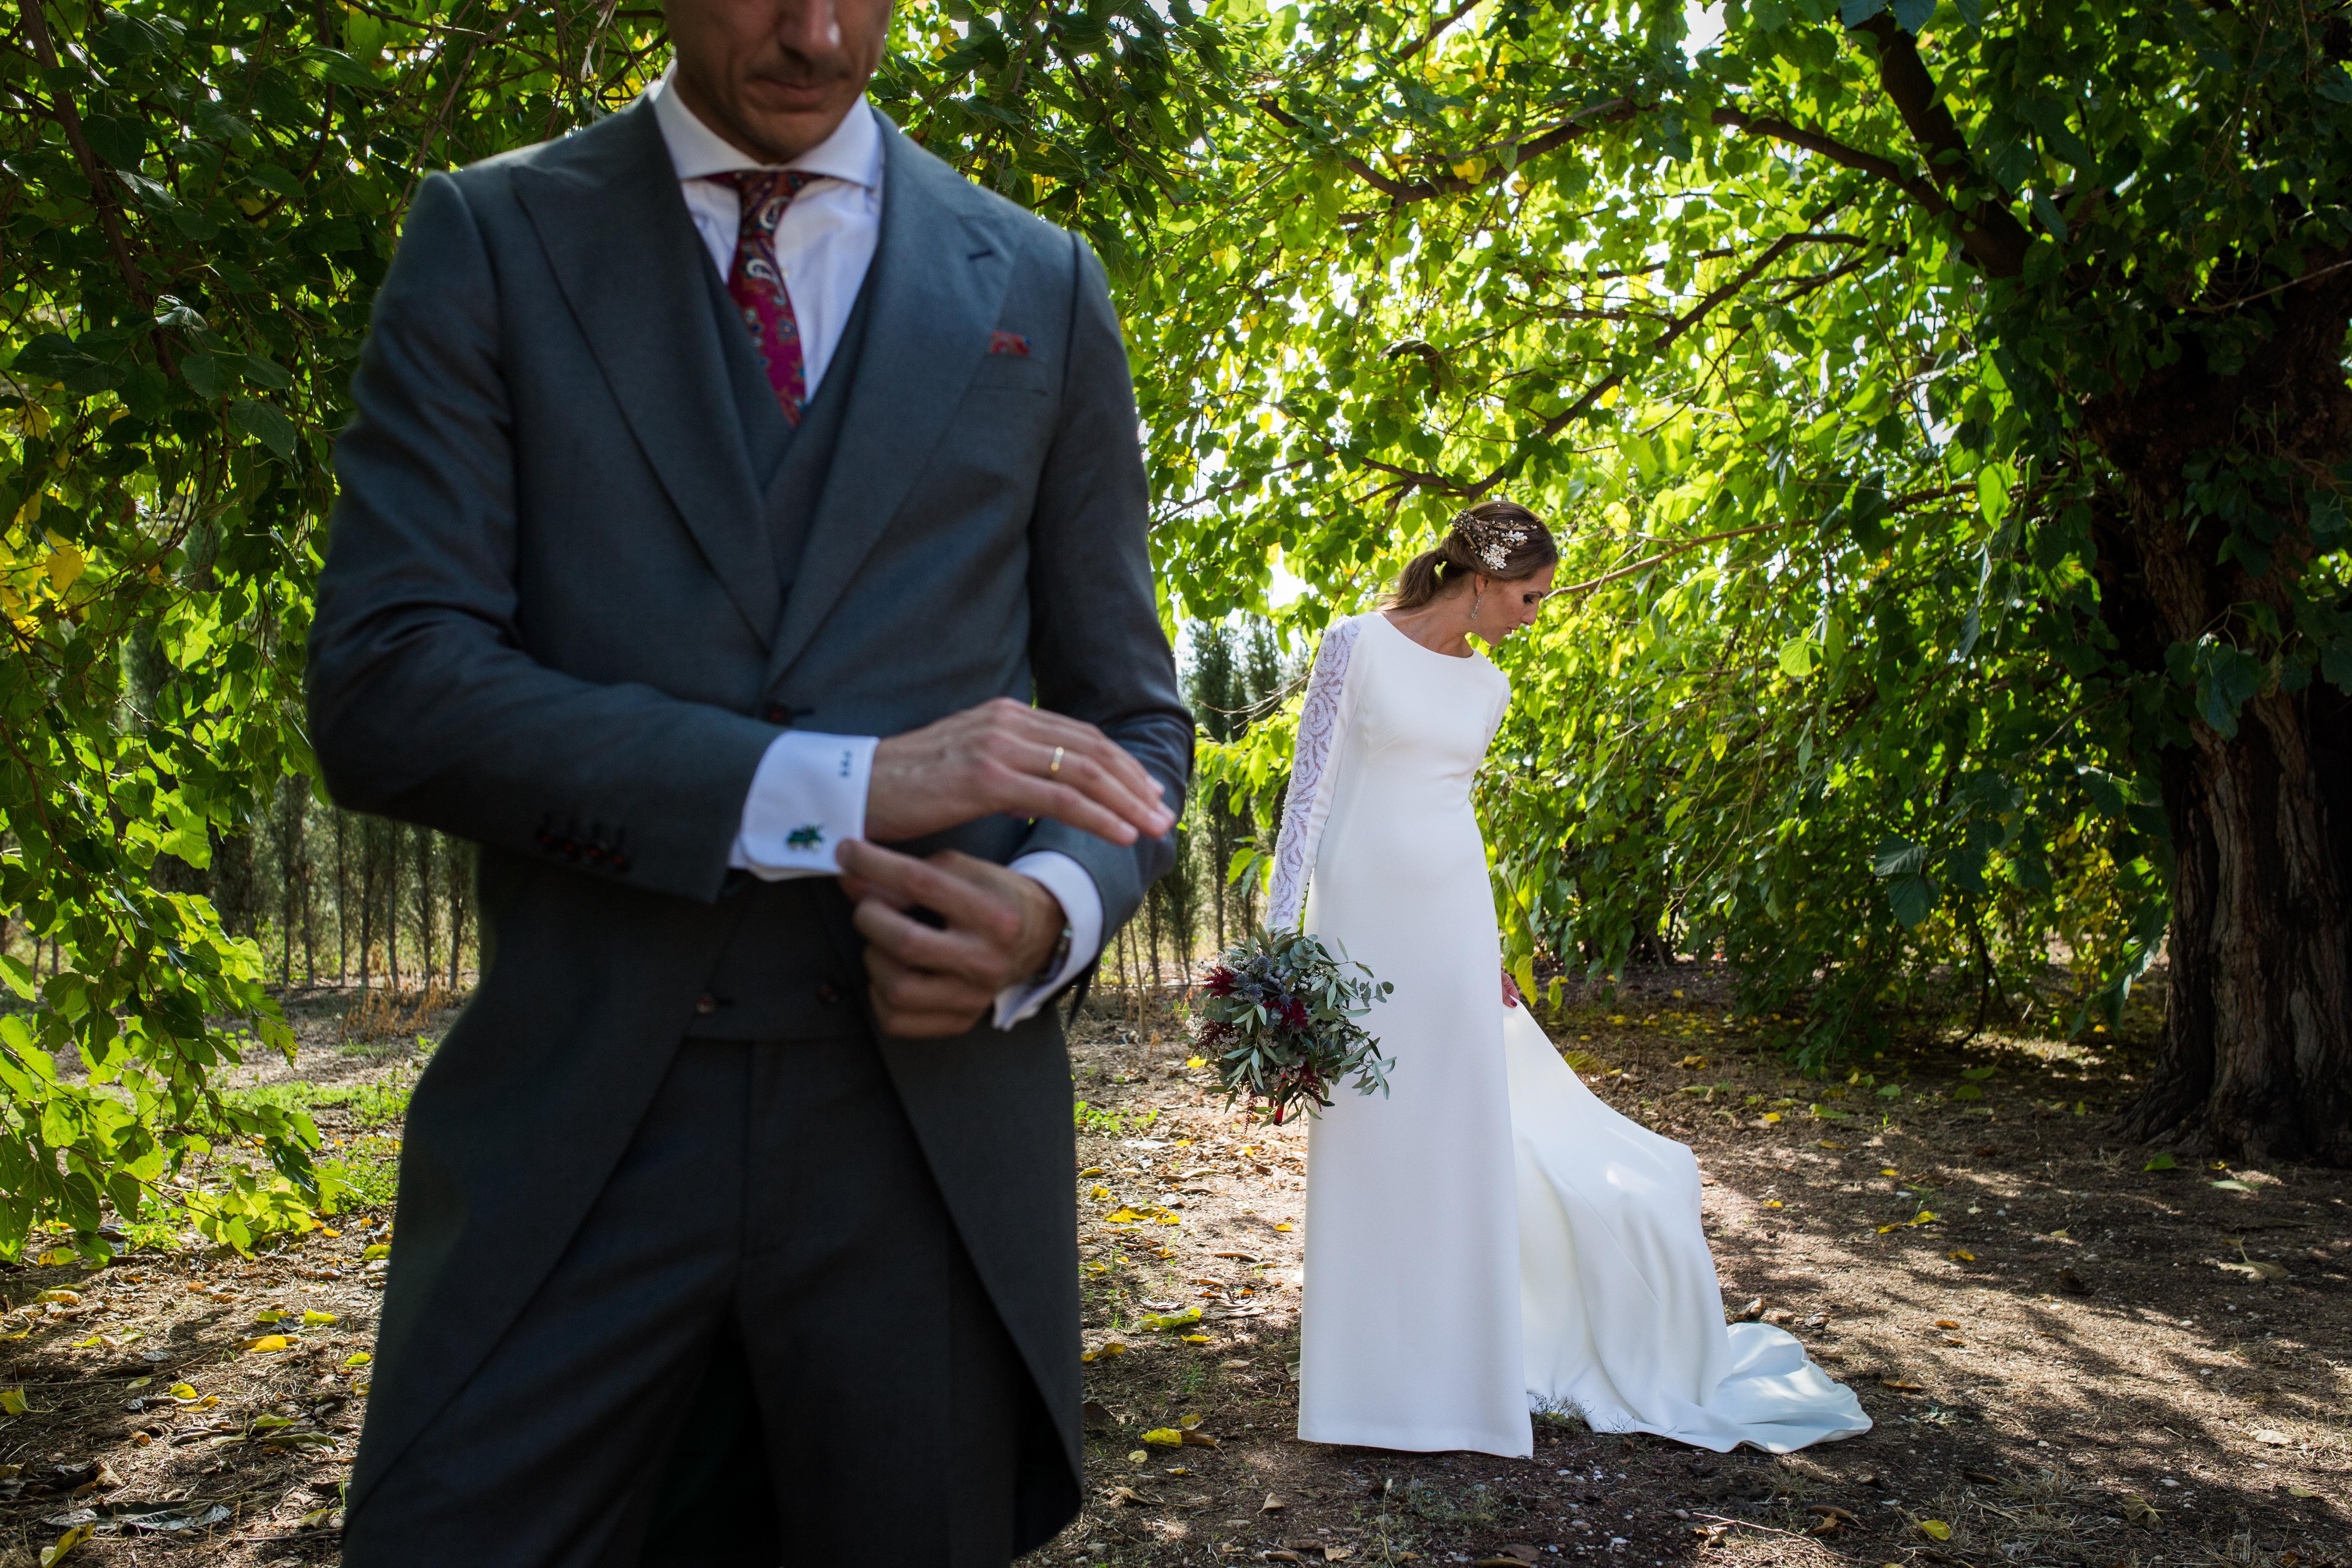 mandarina weddig, fotografos de boda, fotografo boda soria, fotografo boda barcelona, fotografo boda Madrid, fotografo boda lerida, fotografo boda Huesca_37